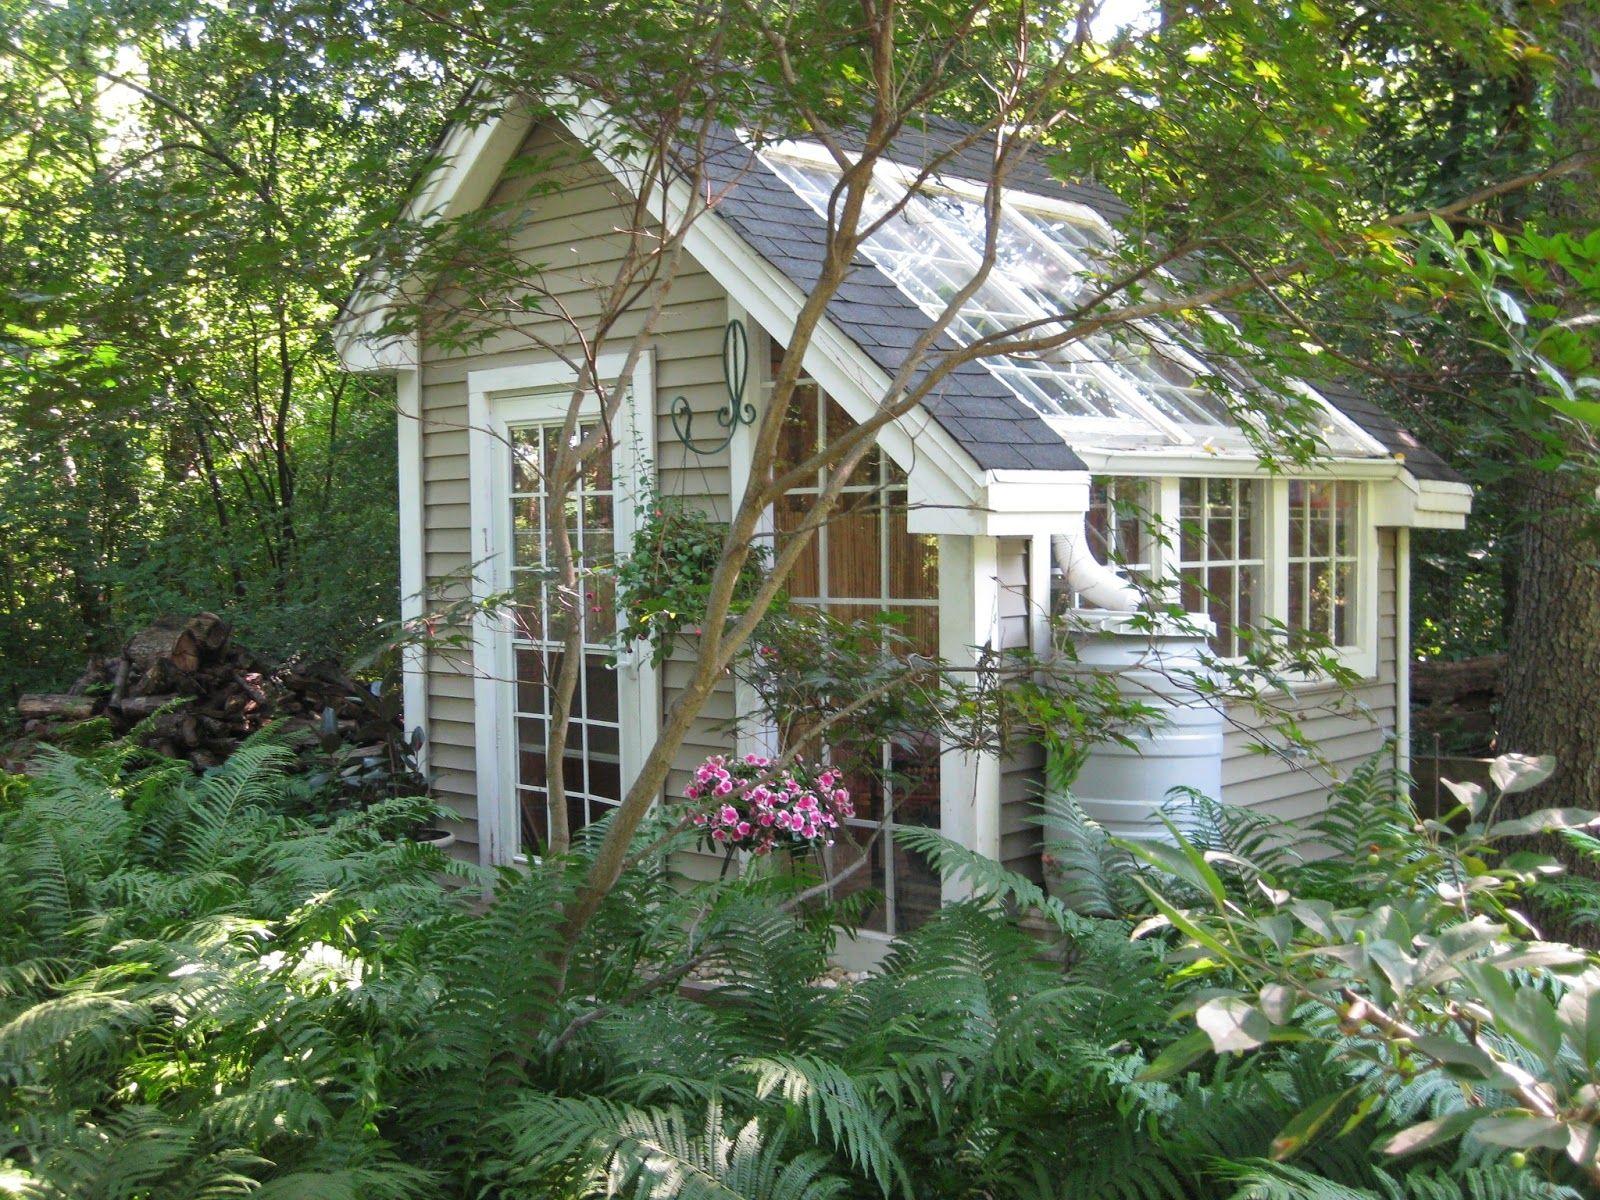 Cottages amp campground rentals riverview cottages campground jackman - Garden Sheds